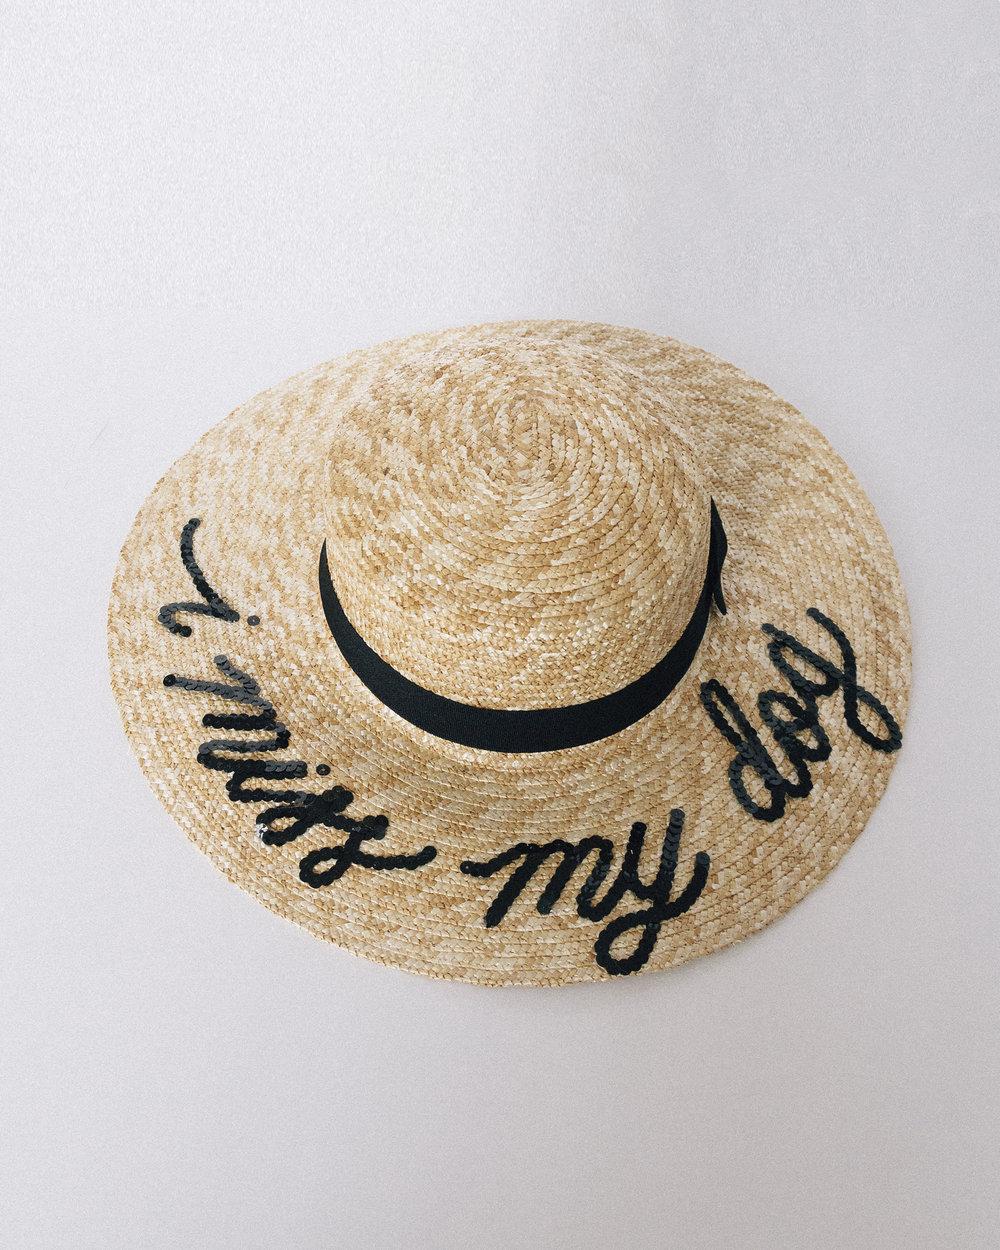 Custom sequin lettered straw sun beach hat quinn luu creative studio jpg  500x625 Personalized sun hats e84245ae5e25